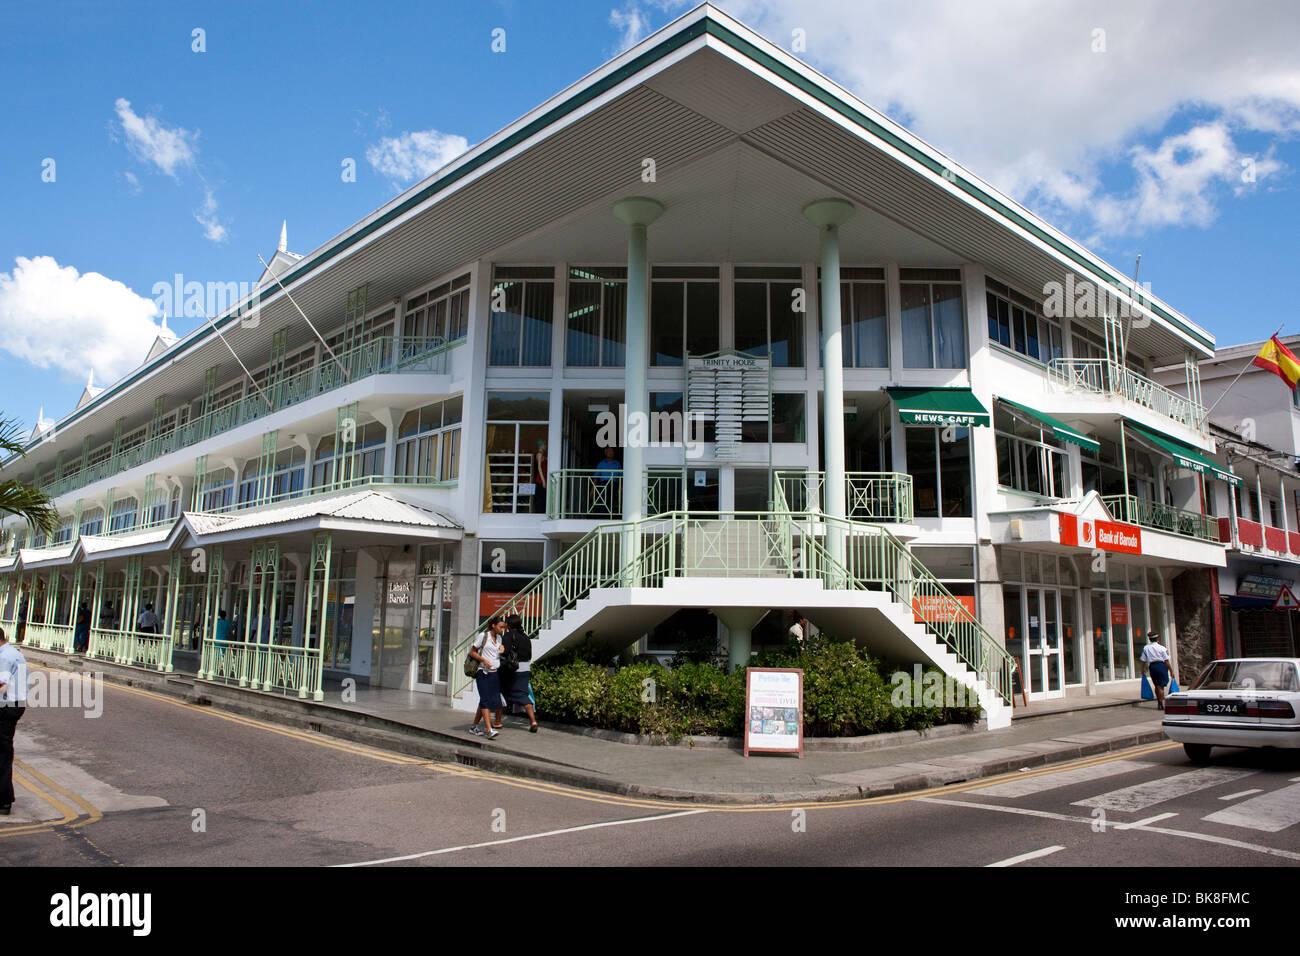 Trinity House in Albert Street, the capital city of Victoria, Mahe Island, Seychelles, Indian Ocean, Africa - Stock Image